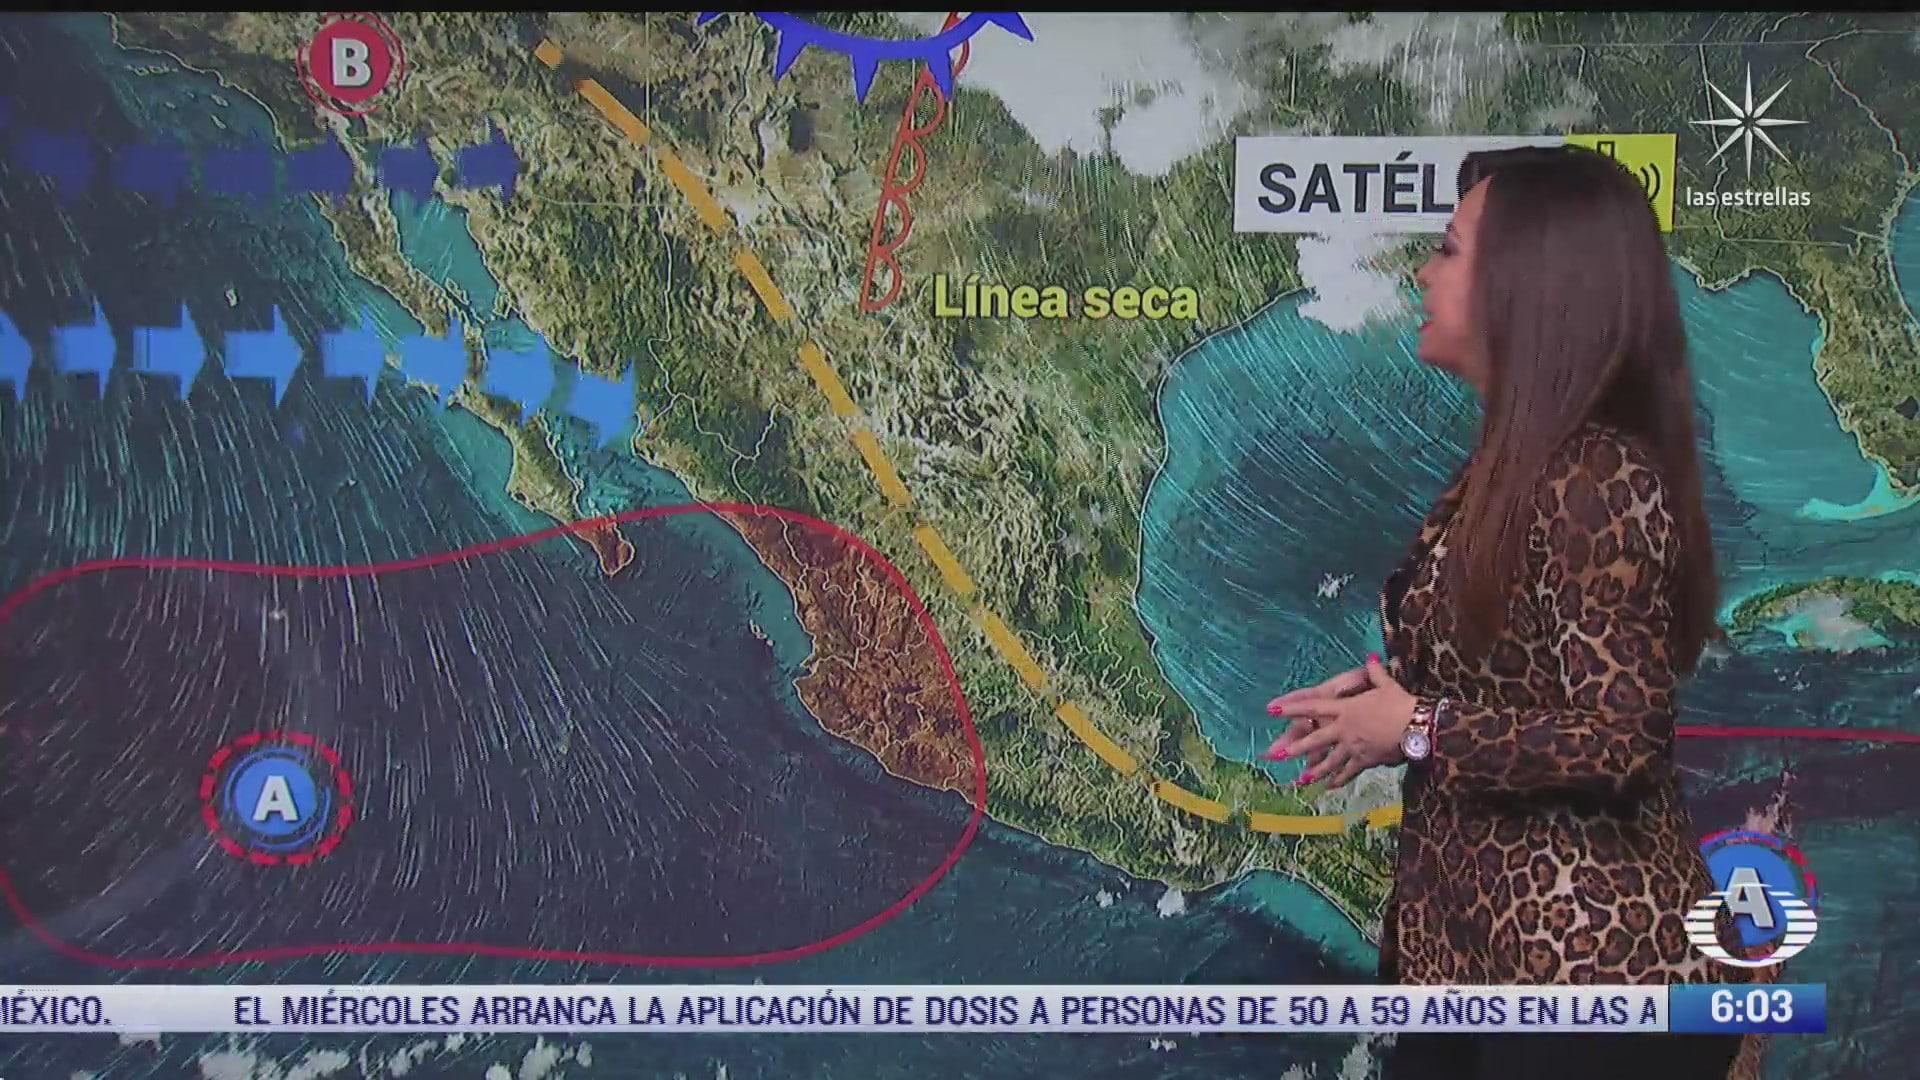 canal de baja presion provocara lluvias en mexico